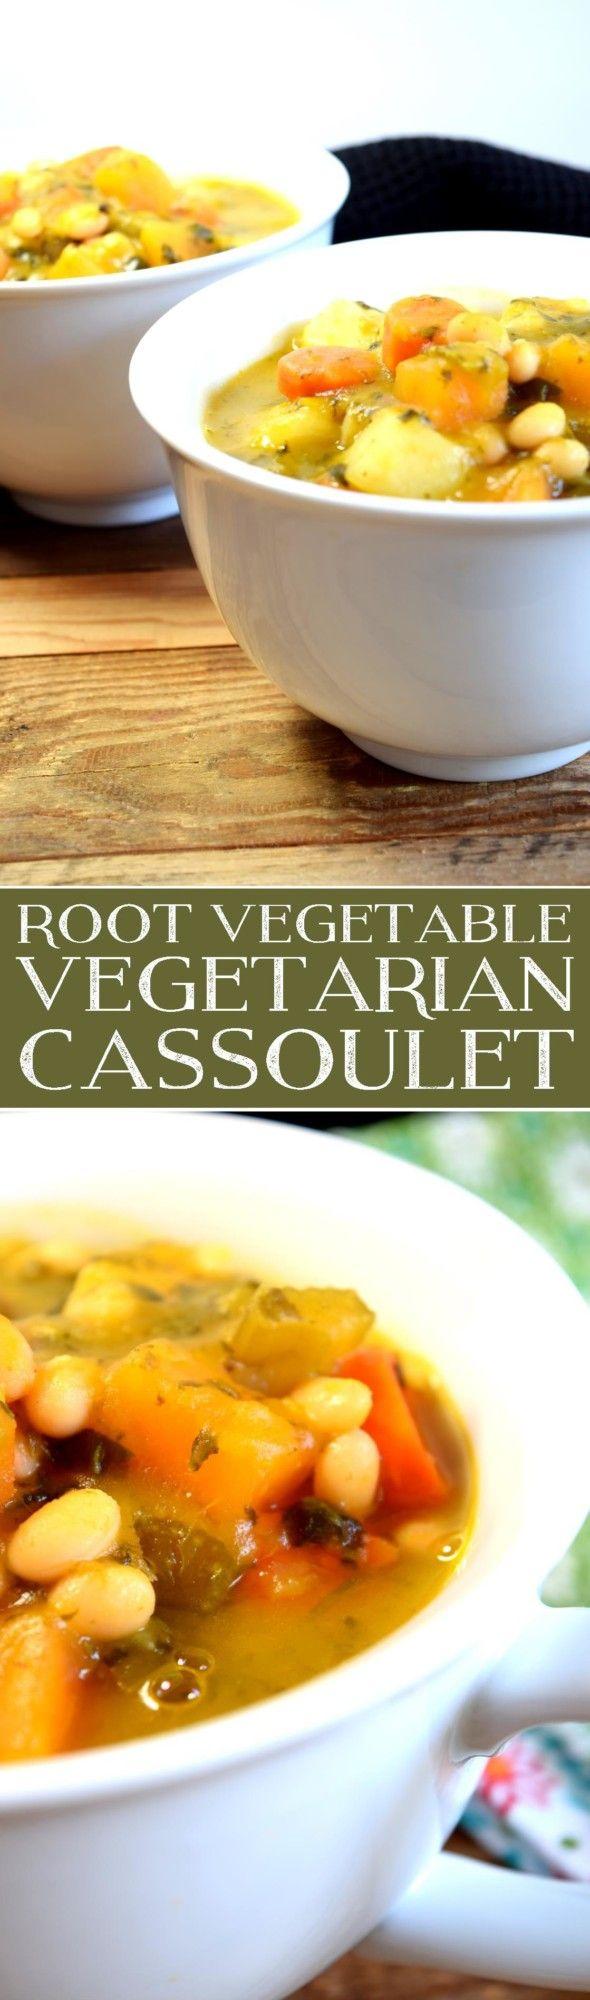 root-vegetable-vegetarian-cassoulet